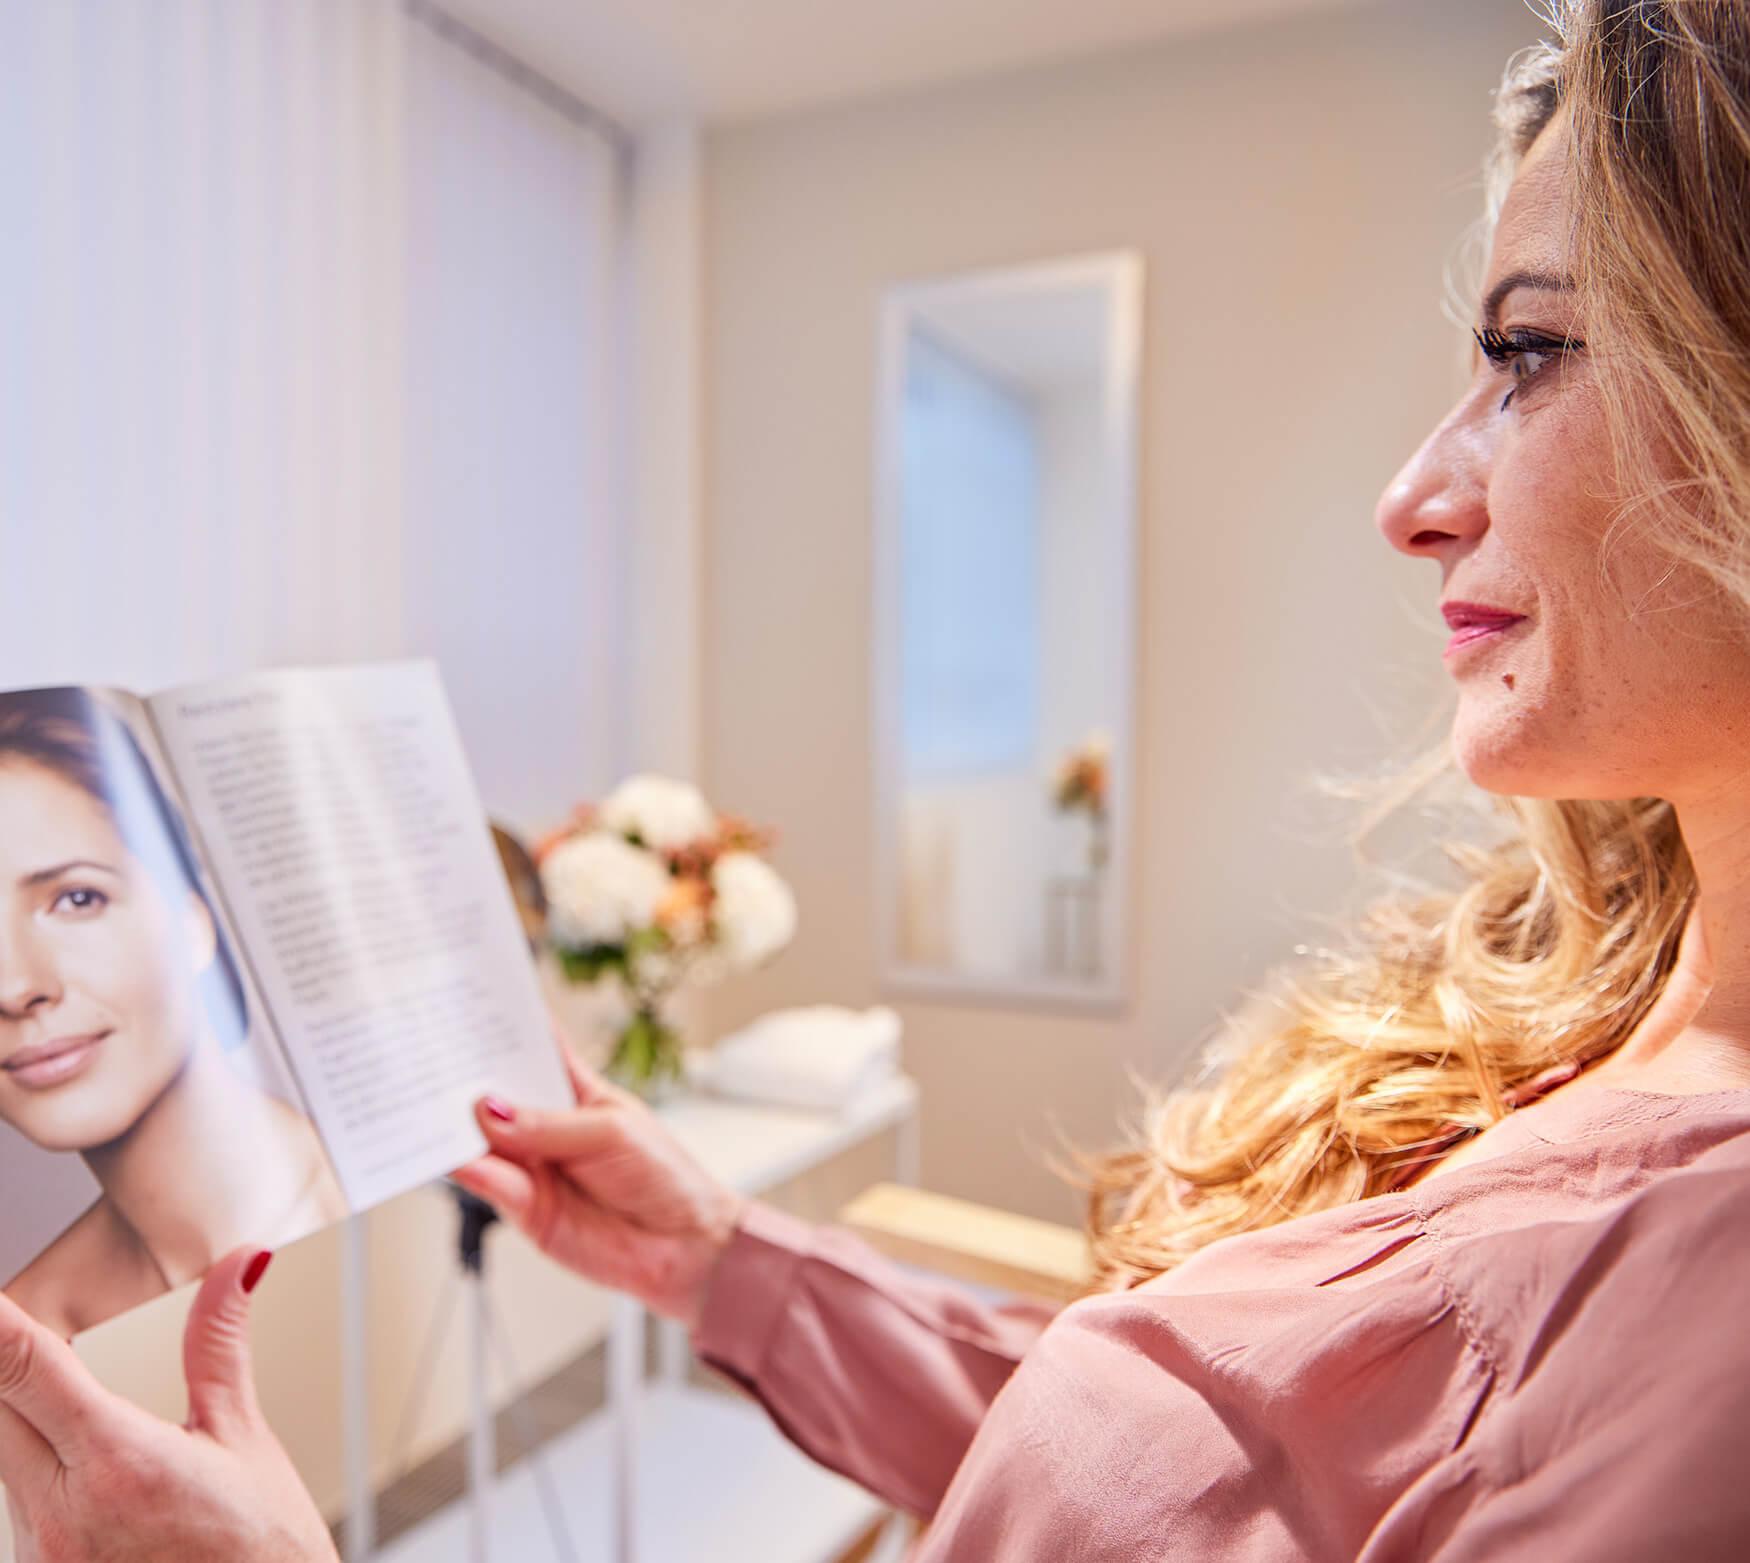 Patientin schaut sich Broschüre zum Thema Filler und Fadenlifting an